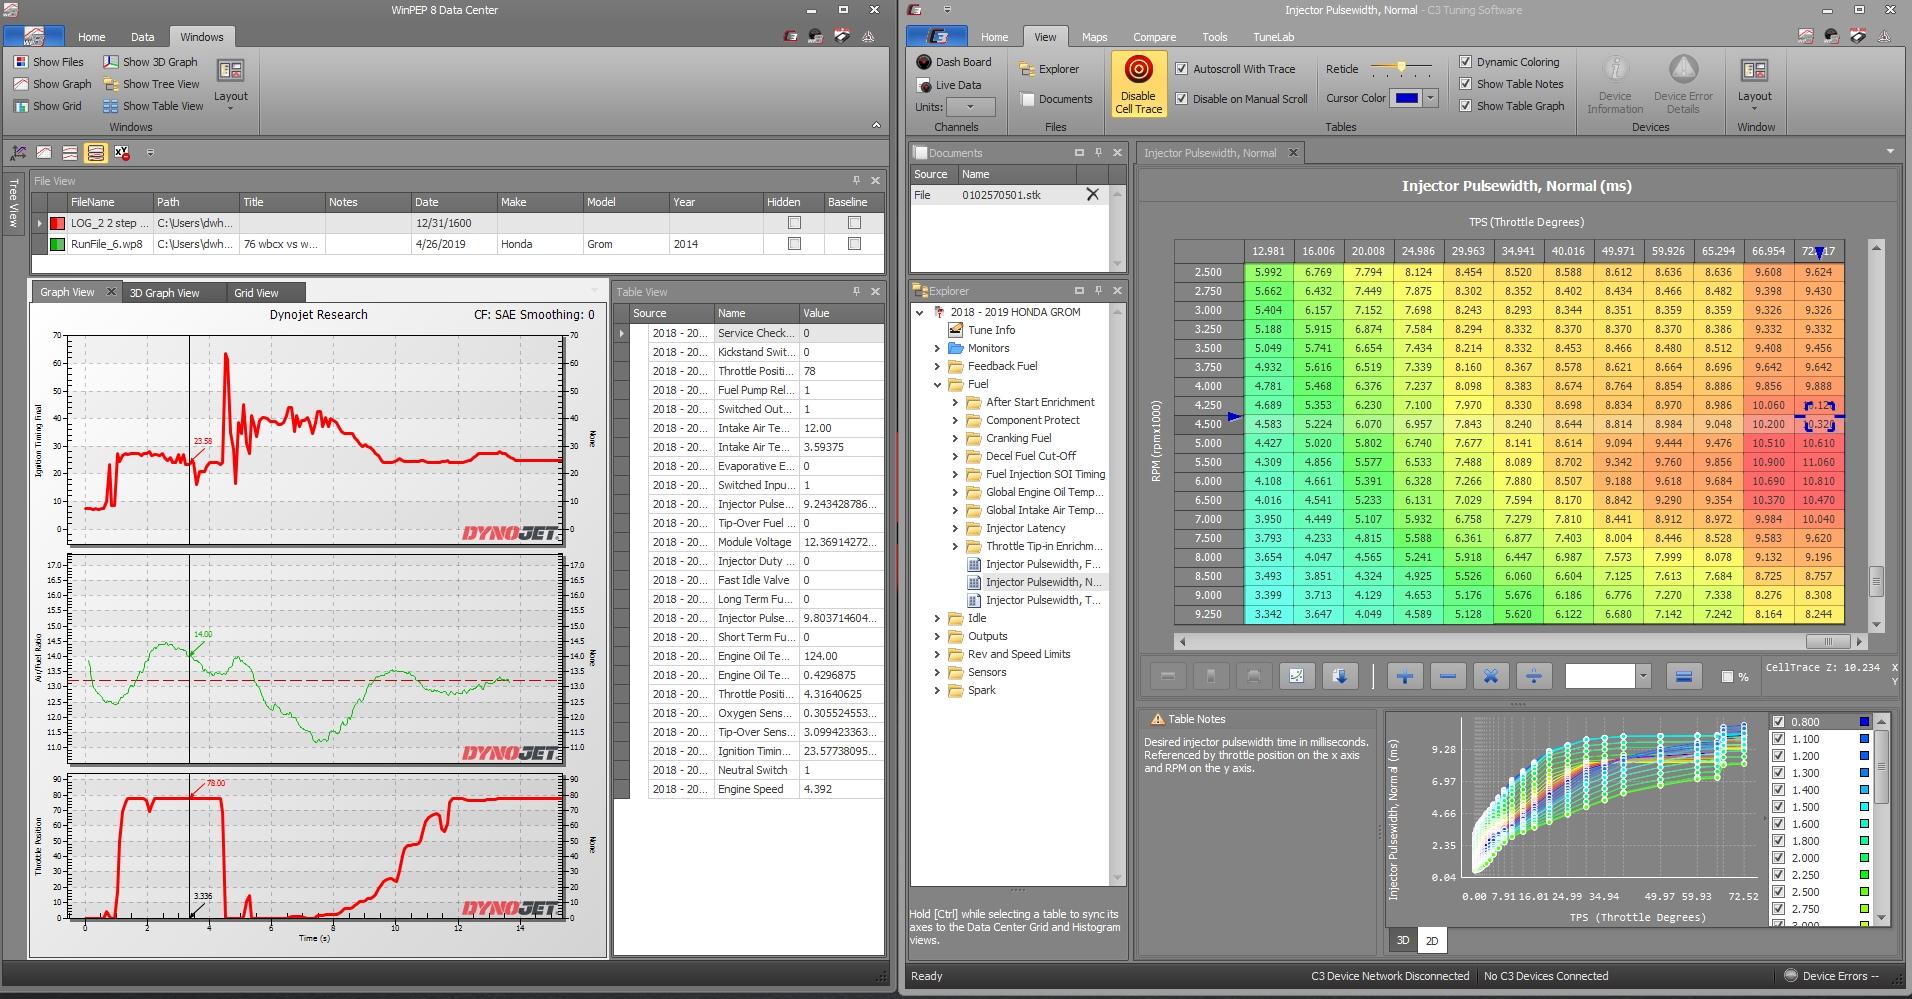 DYNO JET POWER VISION 3 (PV3) for the HONDA GROM   FULL CONTROL REFLASH  PV3-16-01-grom-pcss_super-sync.jpg